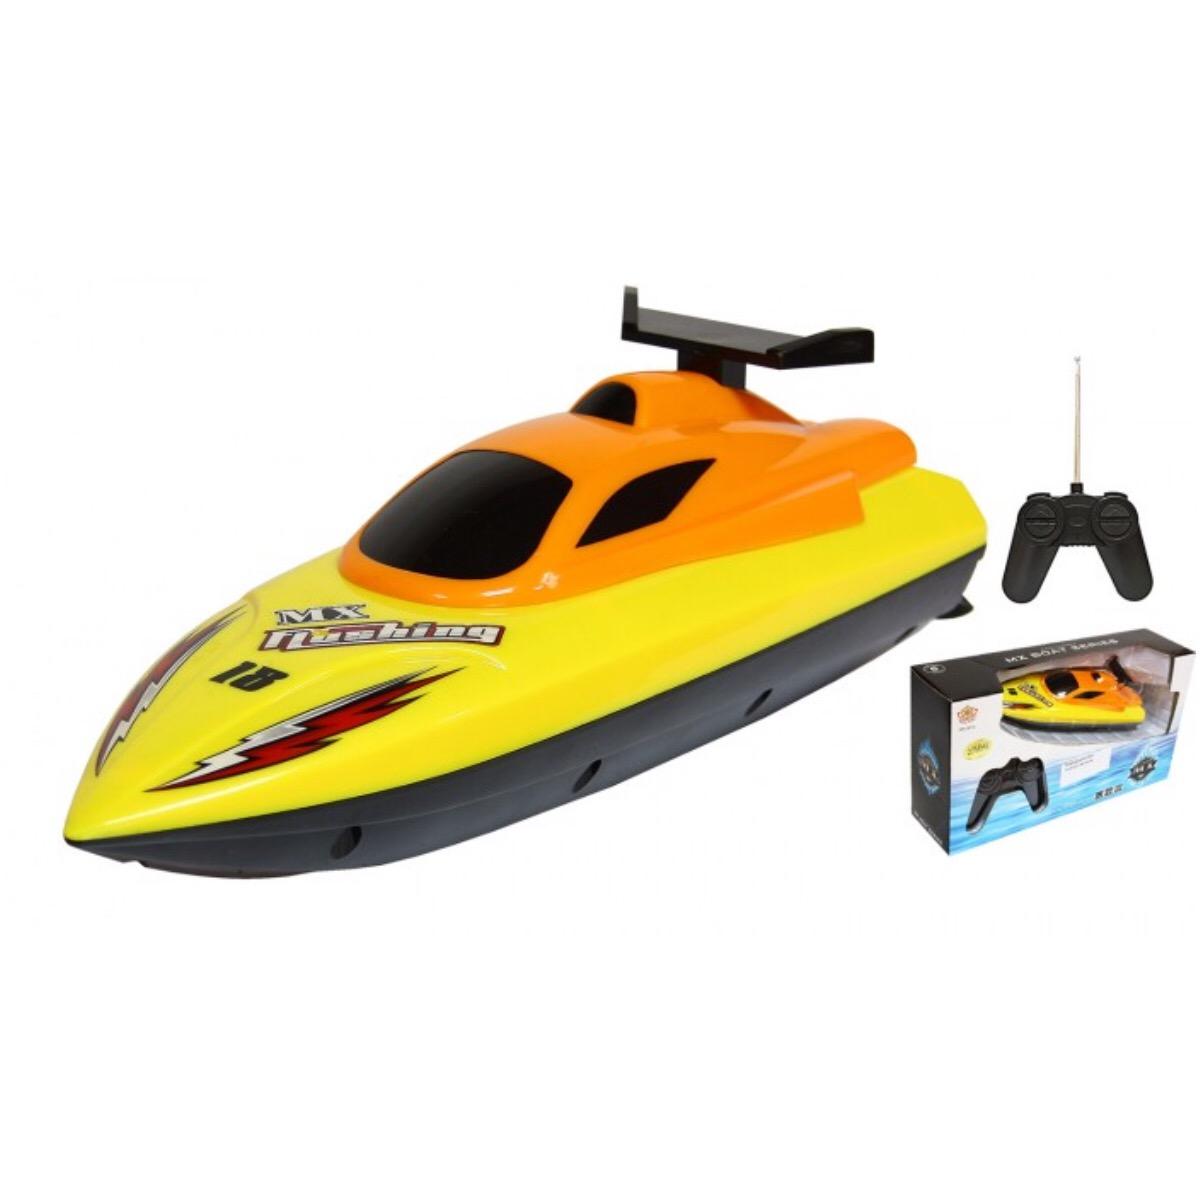 Катер р/у – Flashing, желтыйКатера, лодки и корабли на радиоуправлении<br>Катер р/у – Flashing, желтый<br>